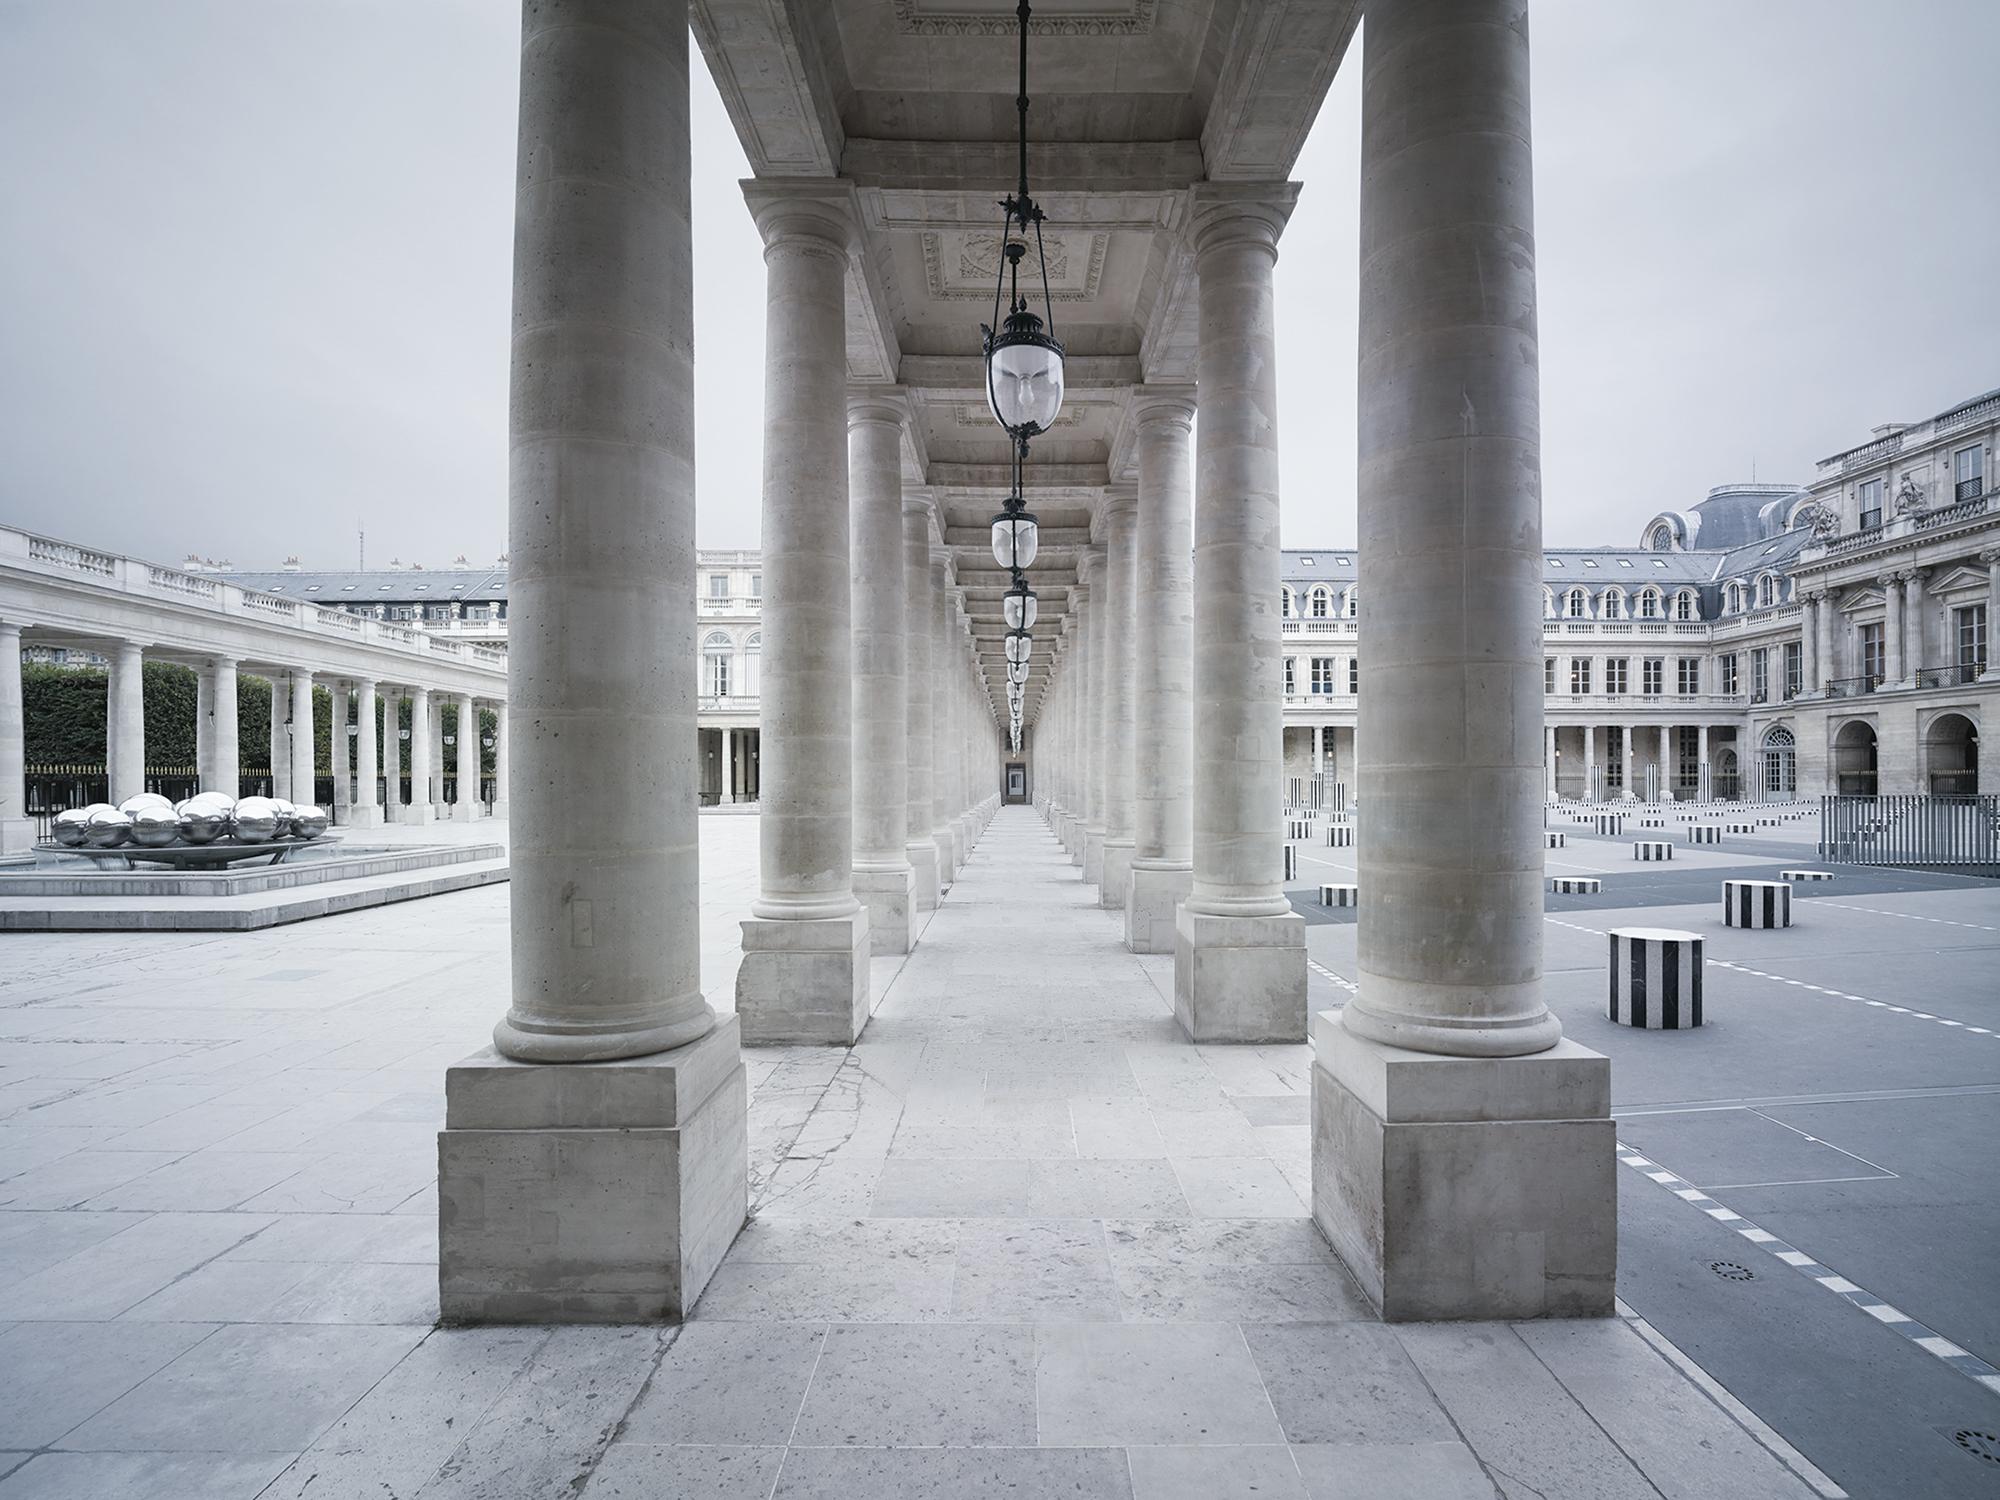 Paris (FR 336.2)